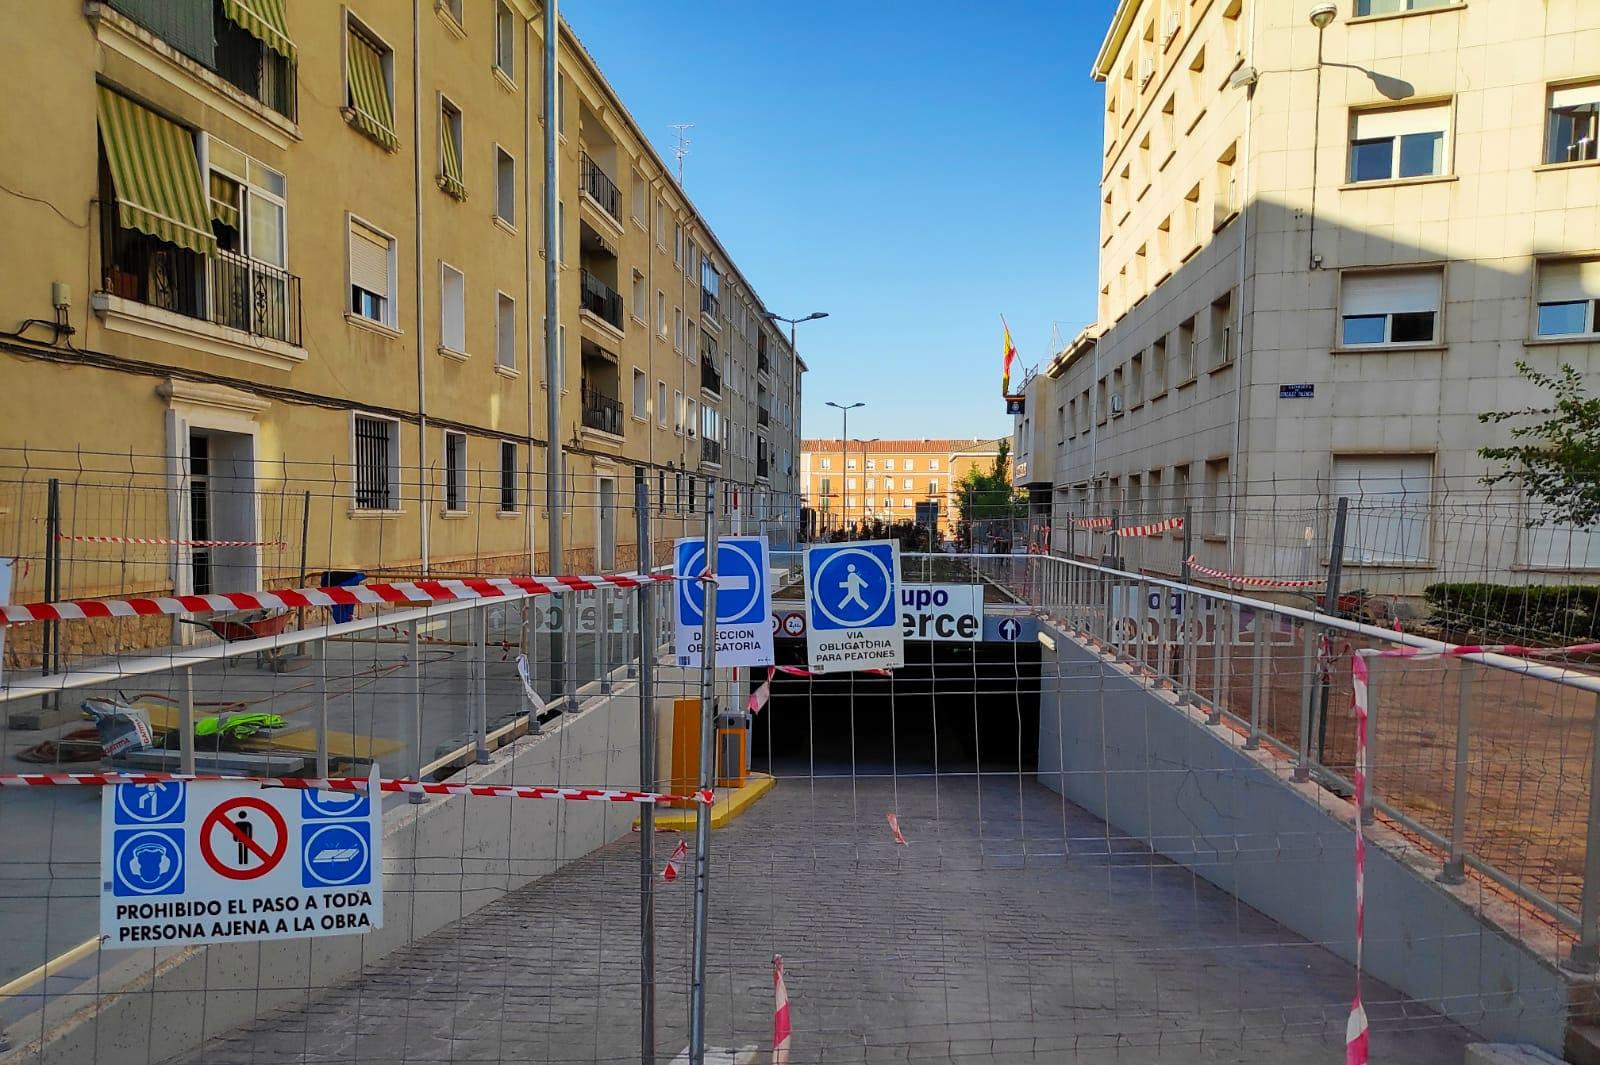 20190802 np gmp plazas cnp parking | Informaciones de Cuenca